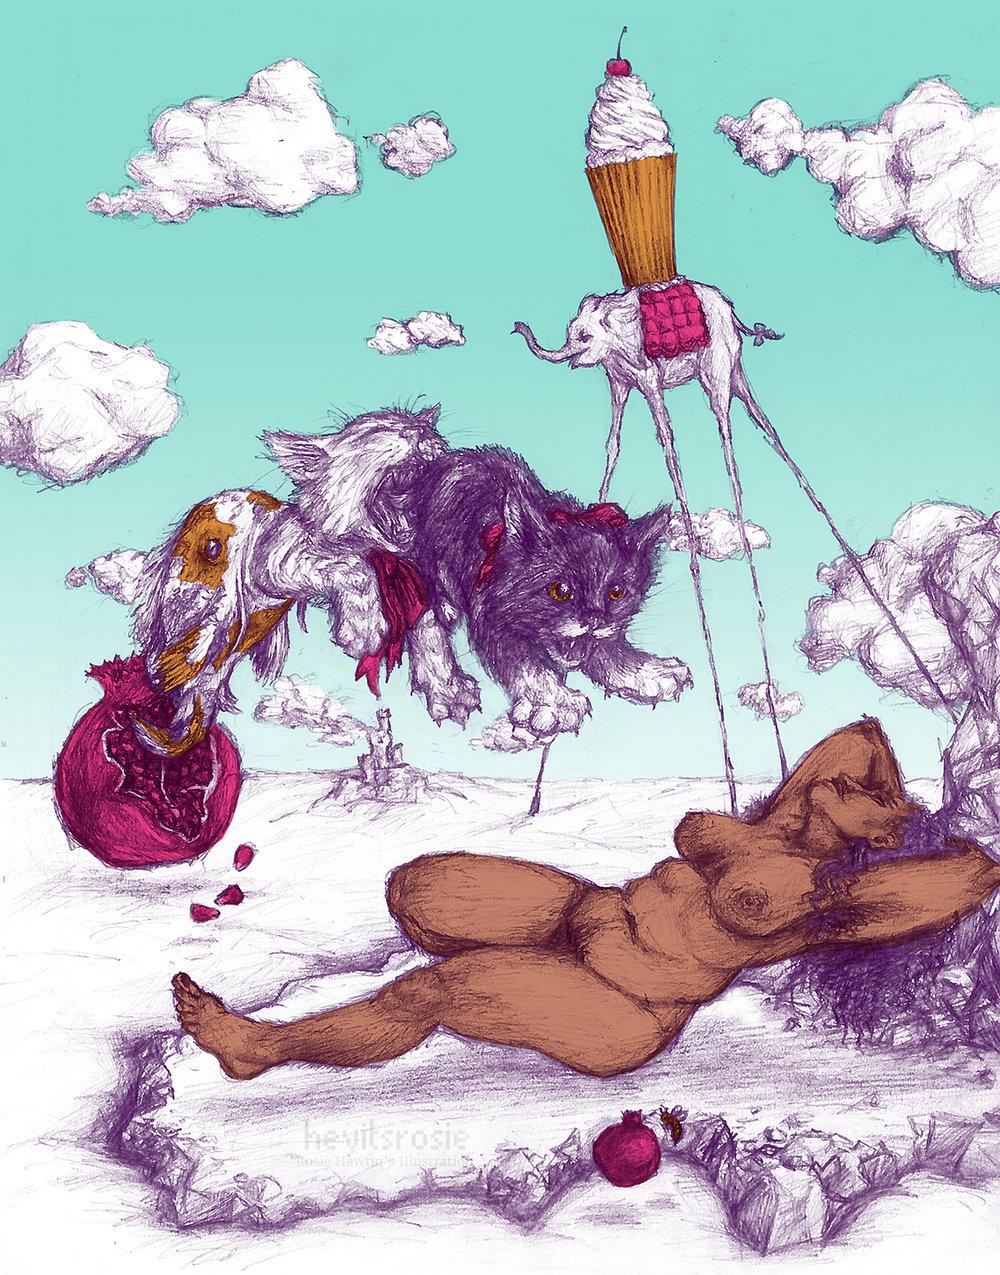 Illustration inspired by Dali